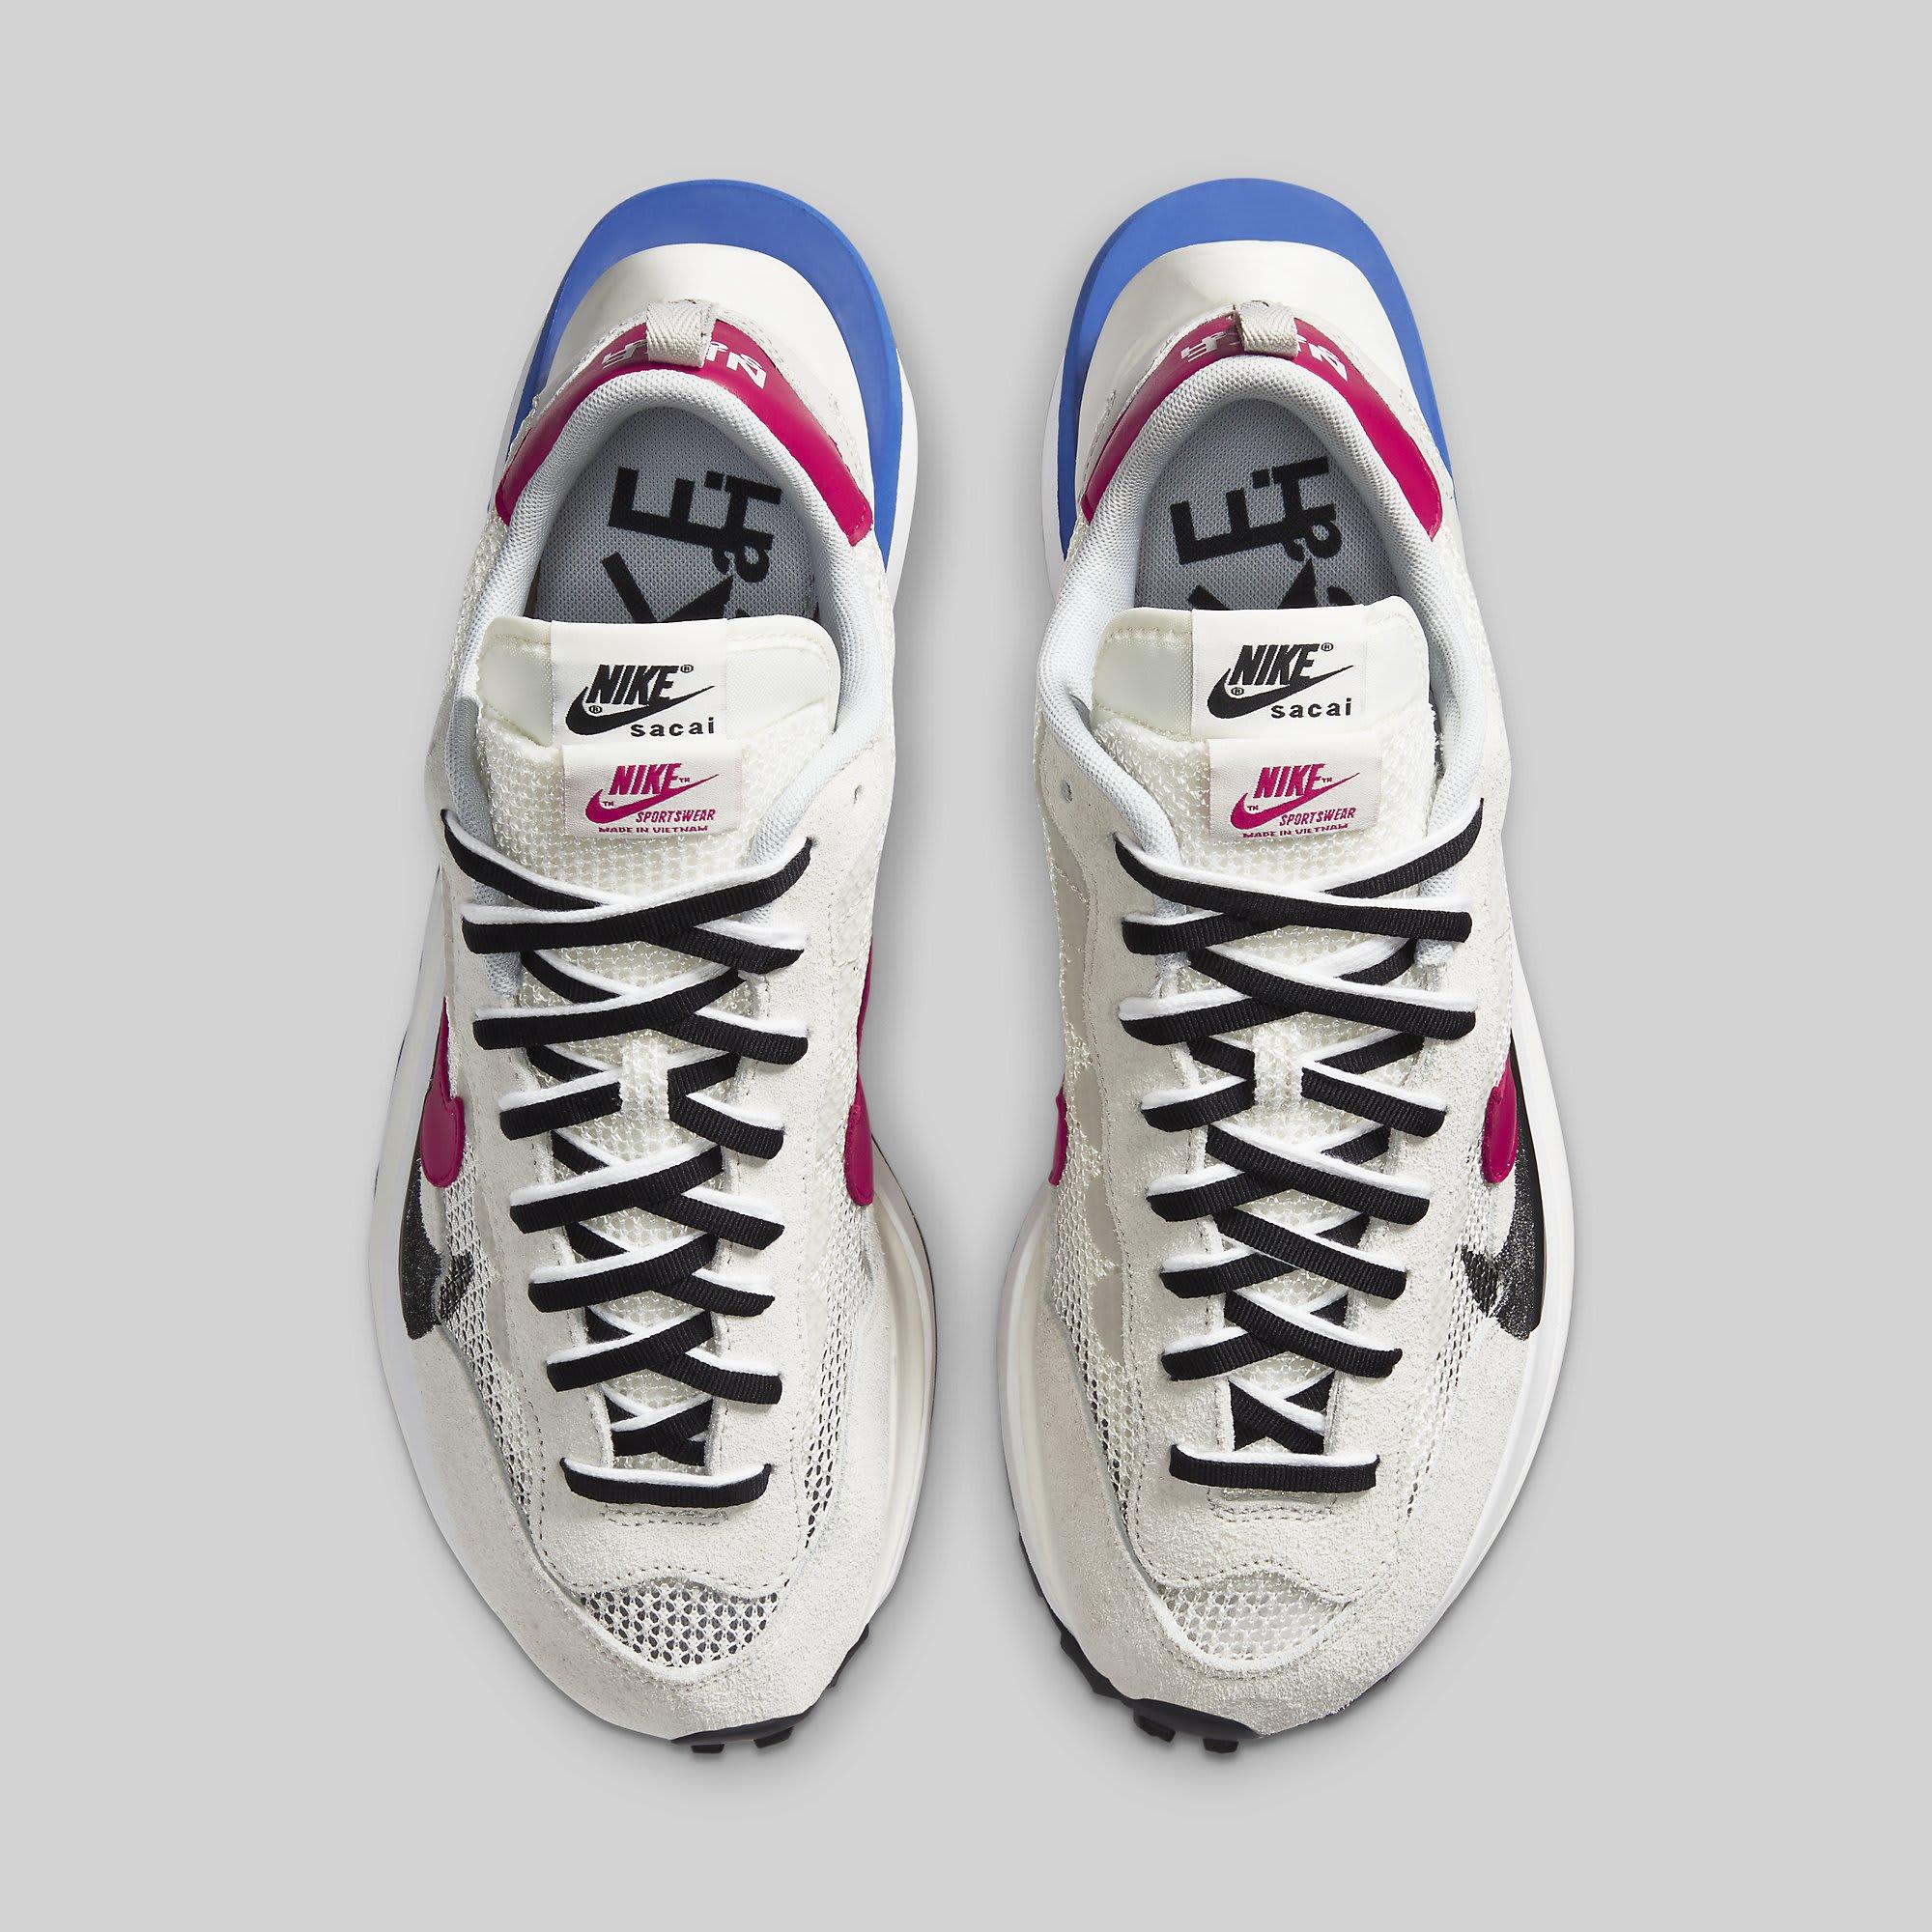 Sacai x Nike VaporWaffle 'Sail' CV1363-100 Top